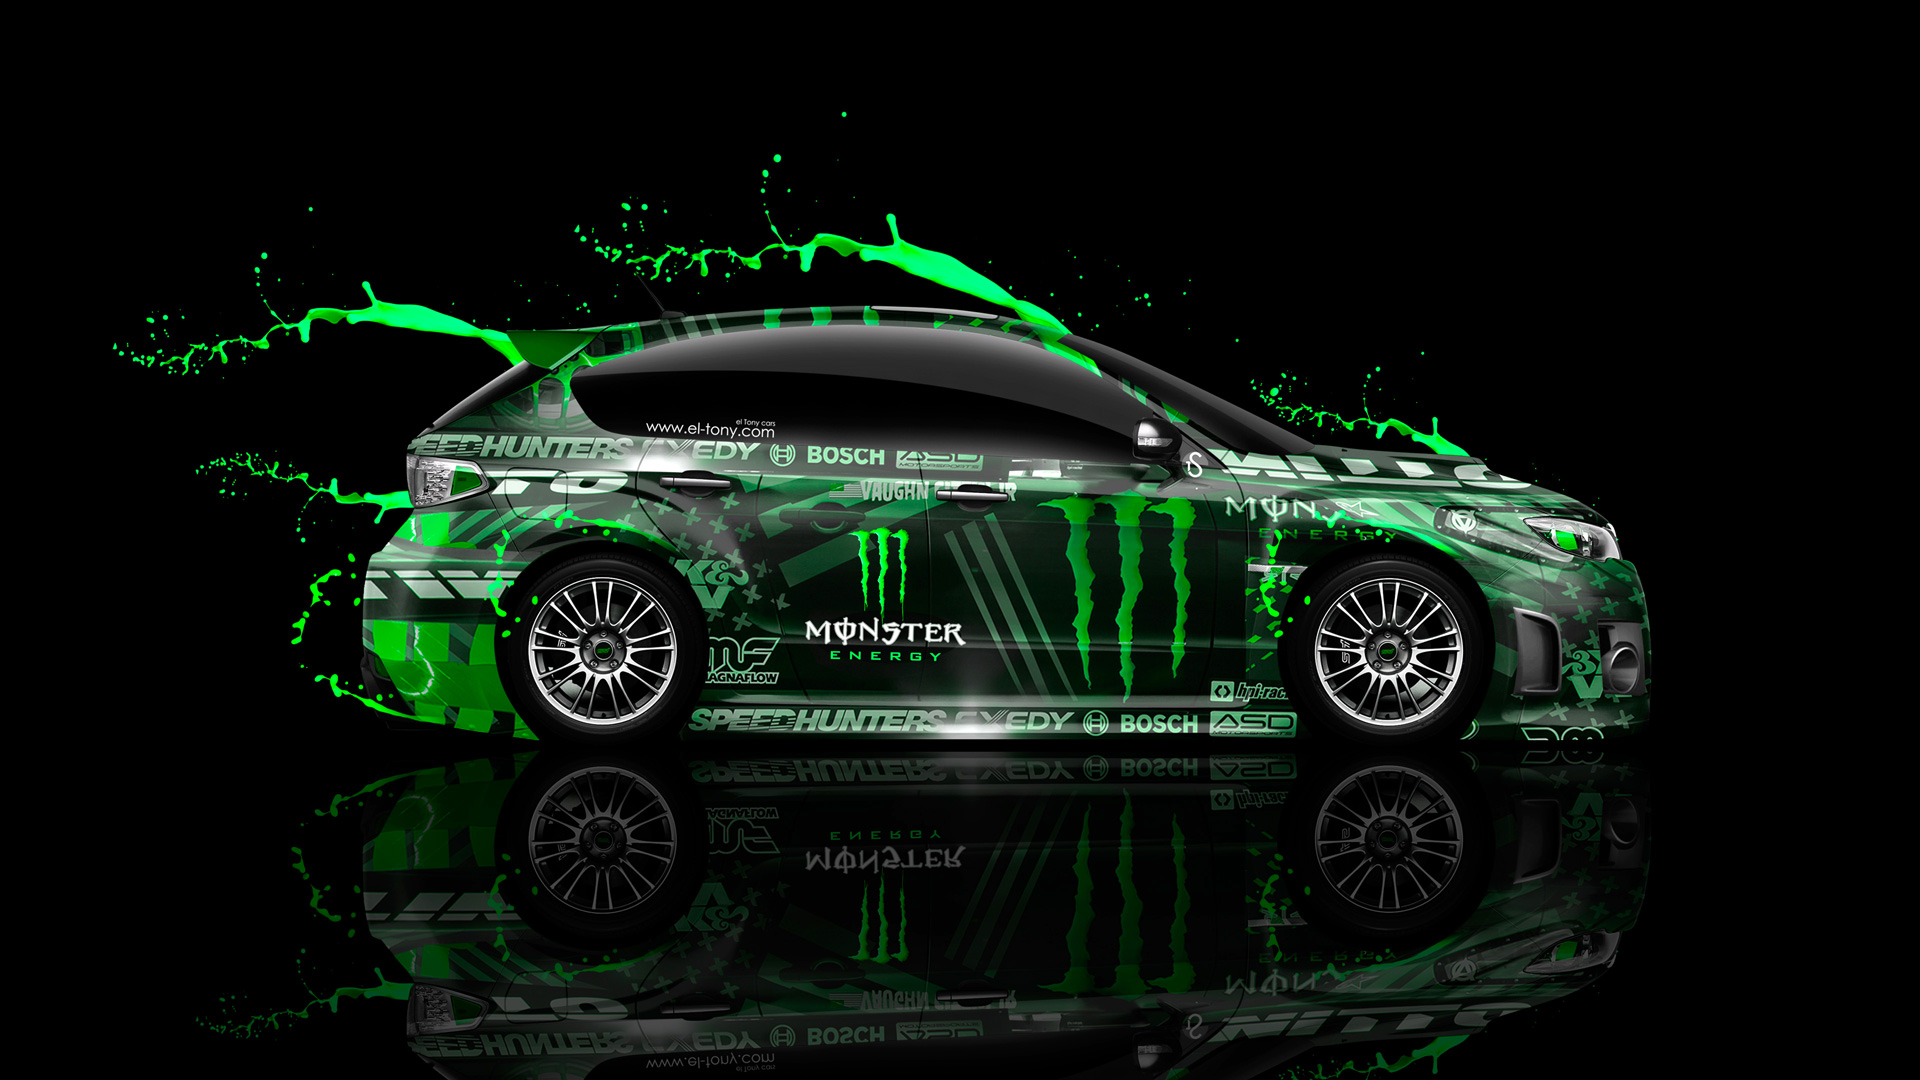 Free Download Monster Energy Subaru Impreza Wrx Sti Jdm Side Green Live Colors Car 1920x1080 For Your Desktop Mobile Tablet Explore 49 Monster Energy Wallpaper Car Monster Energy Wallpaper